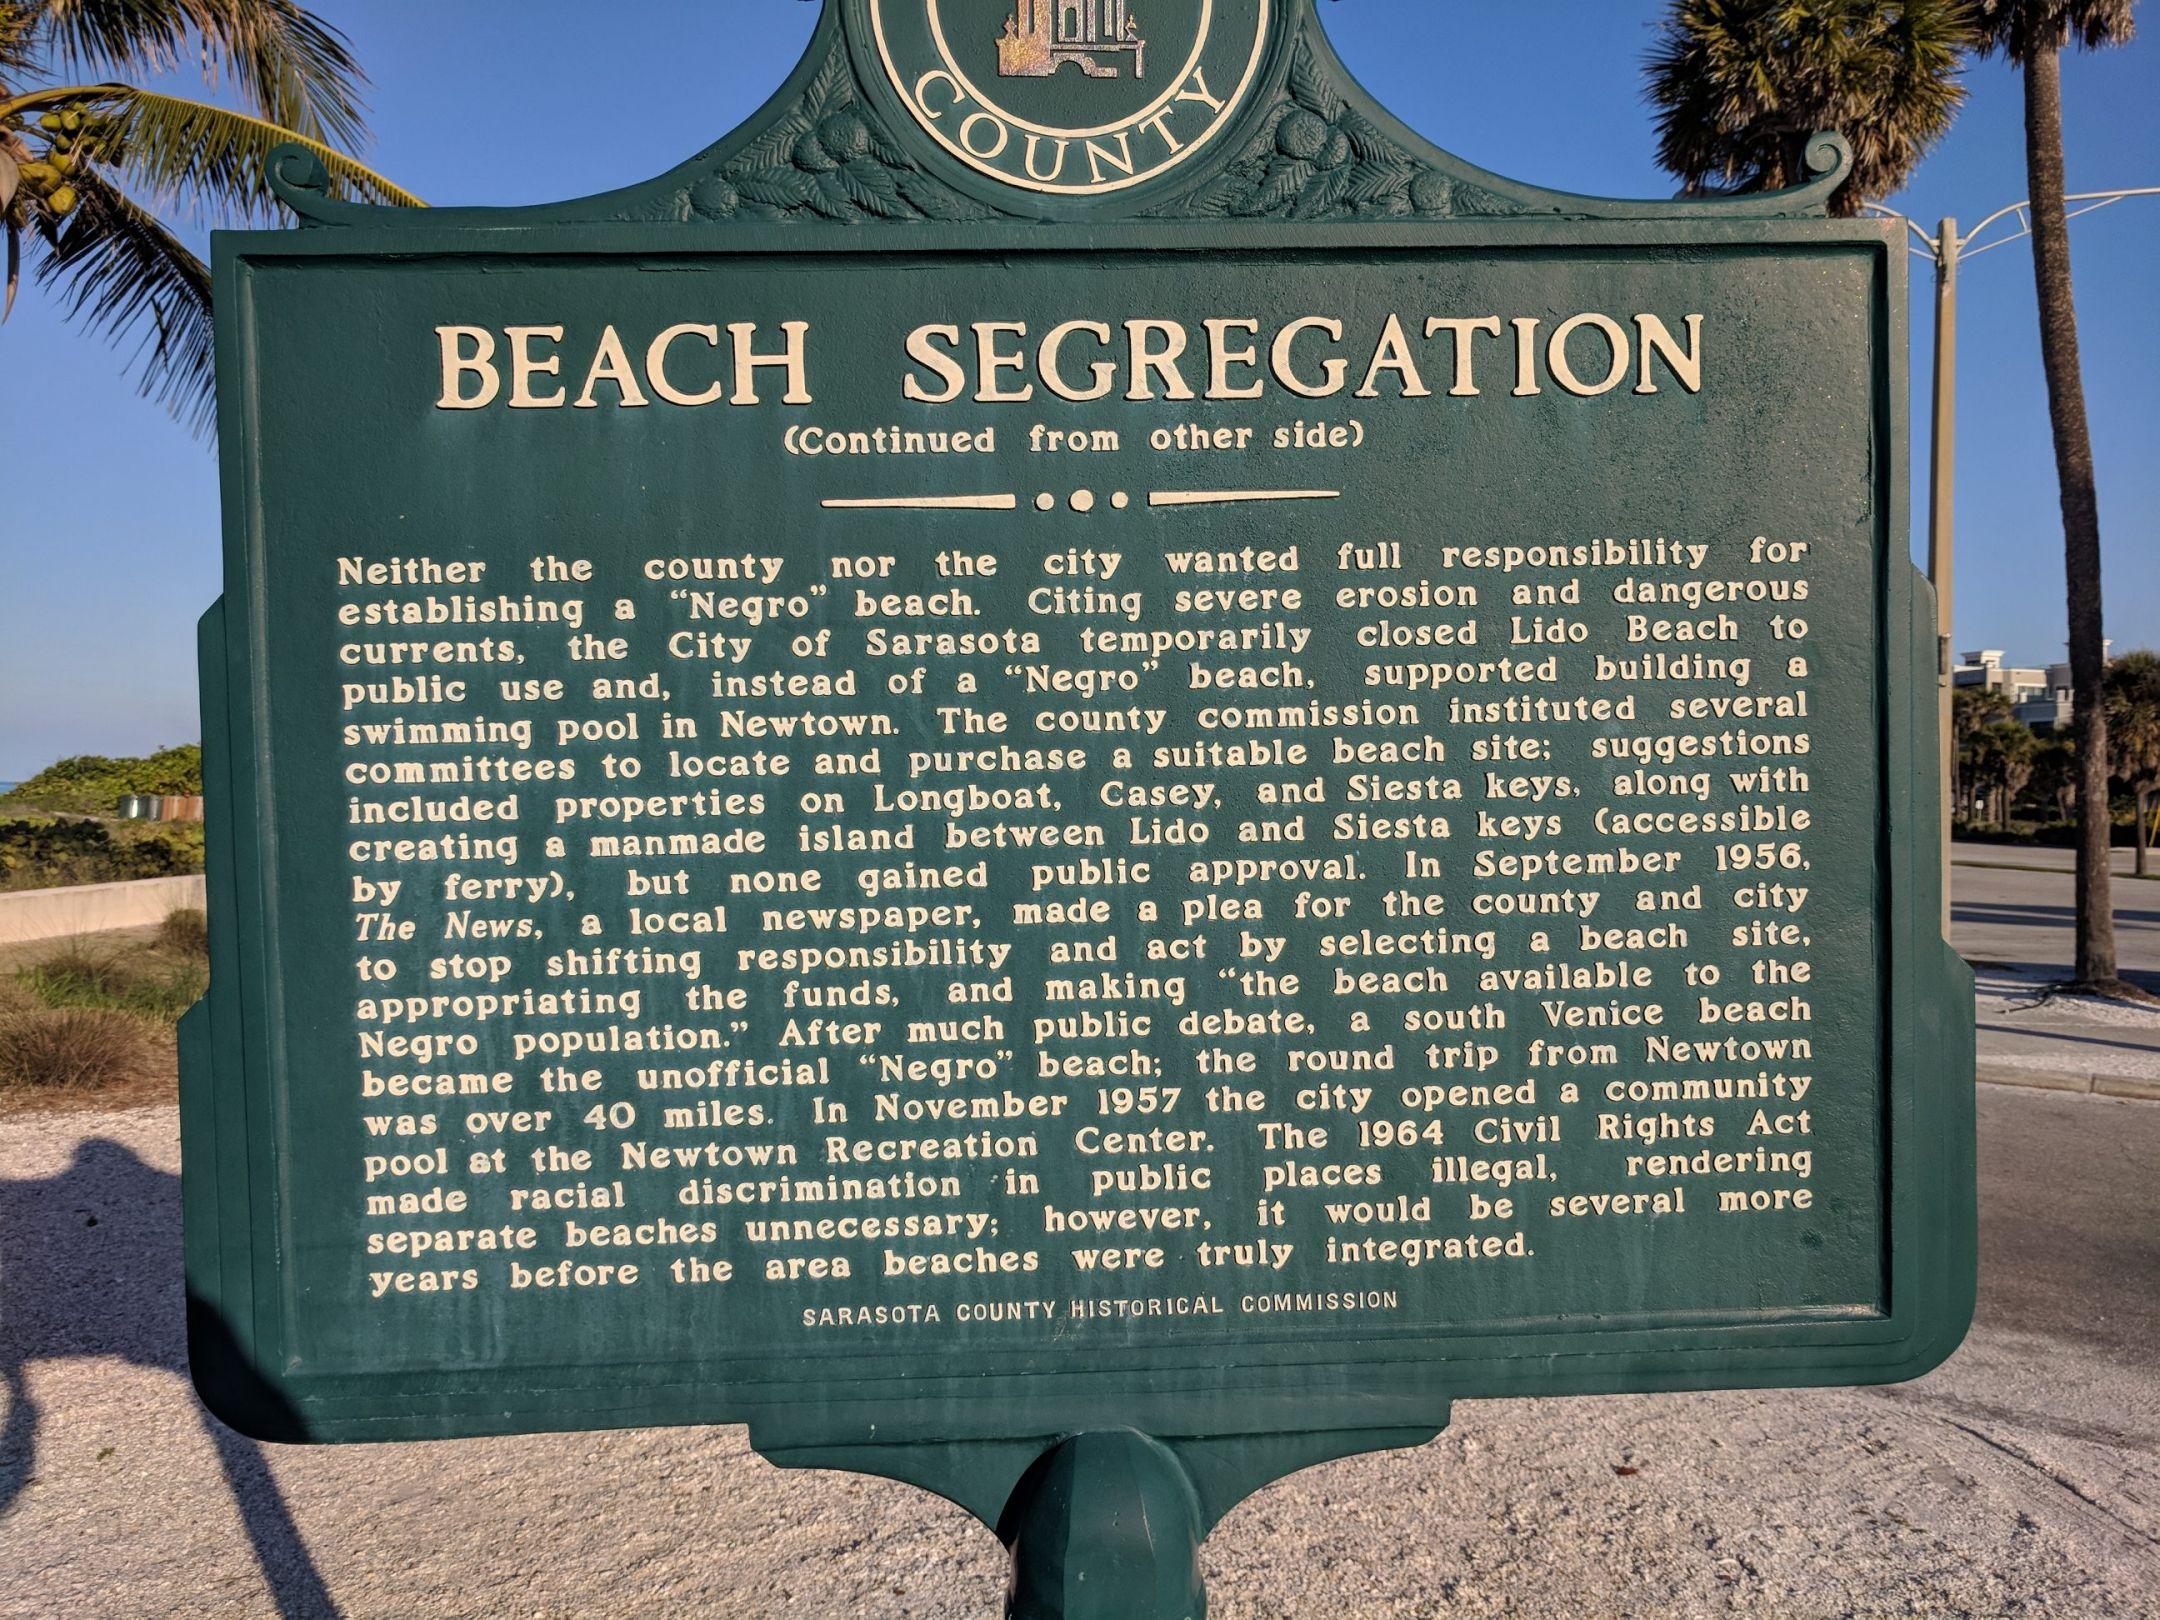 Beach segregation information continued